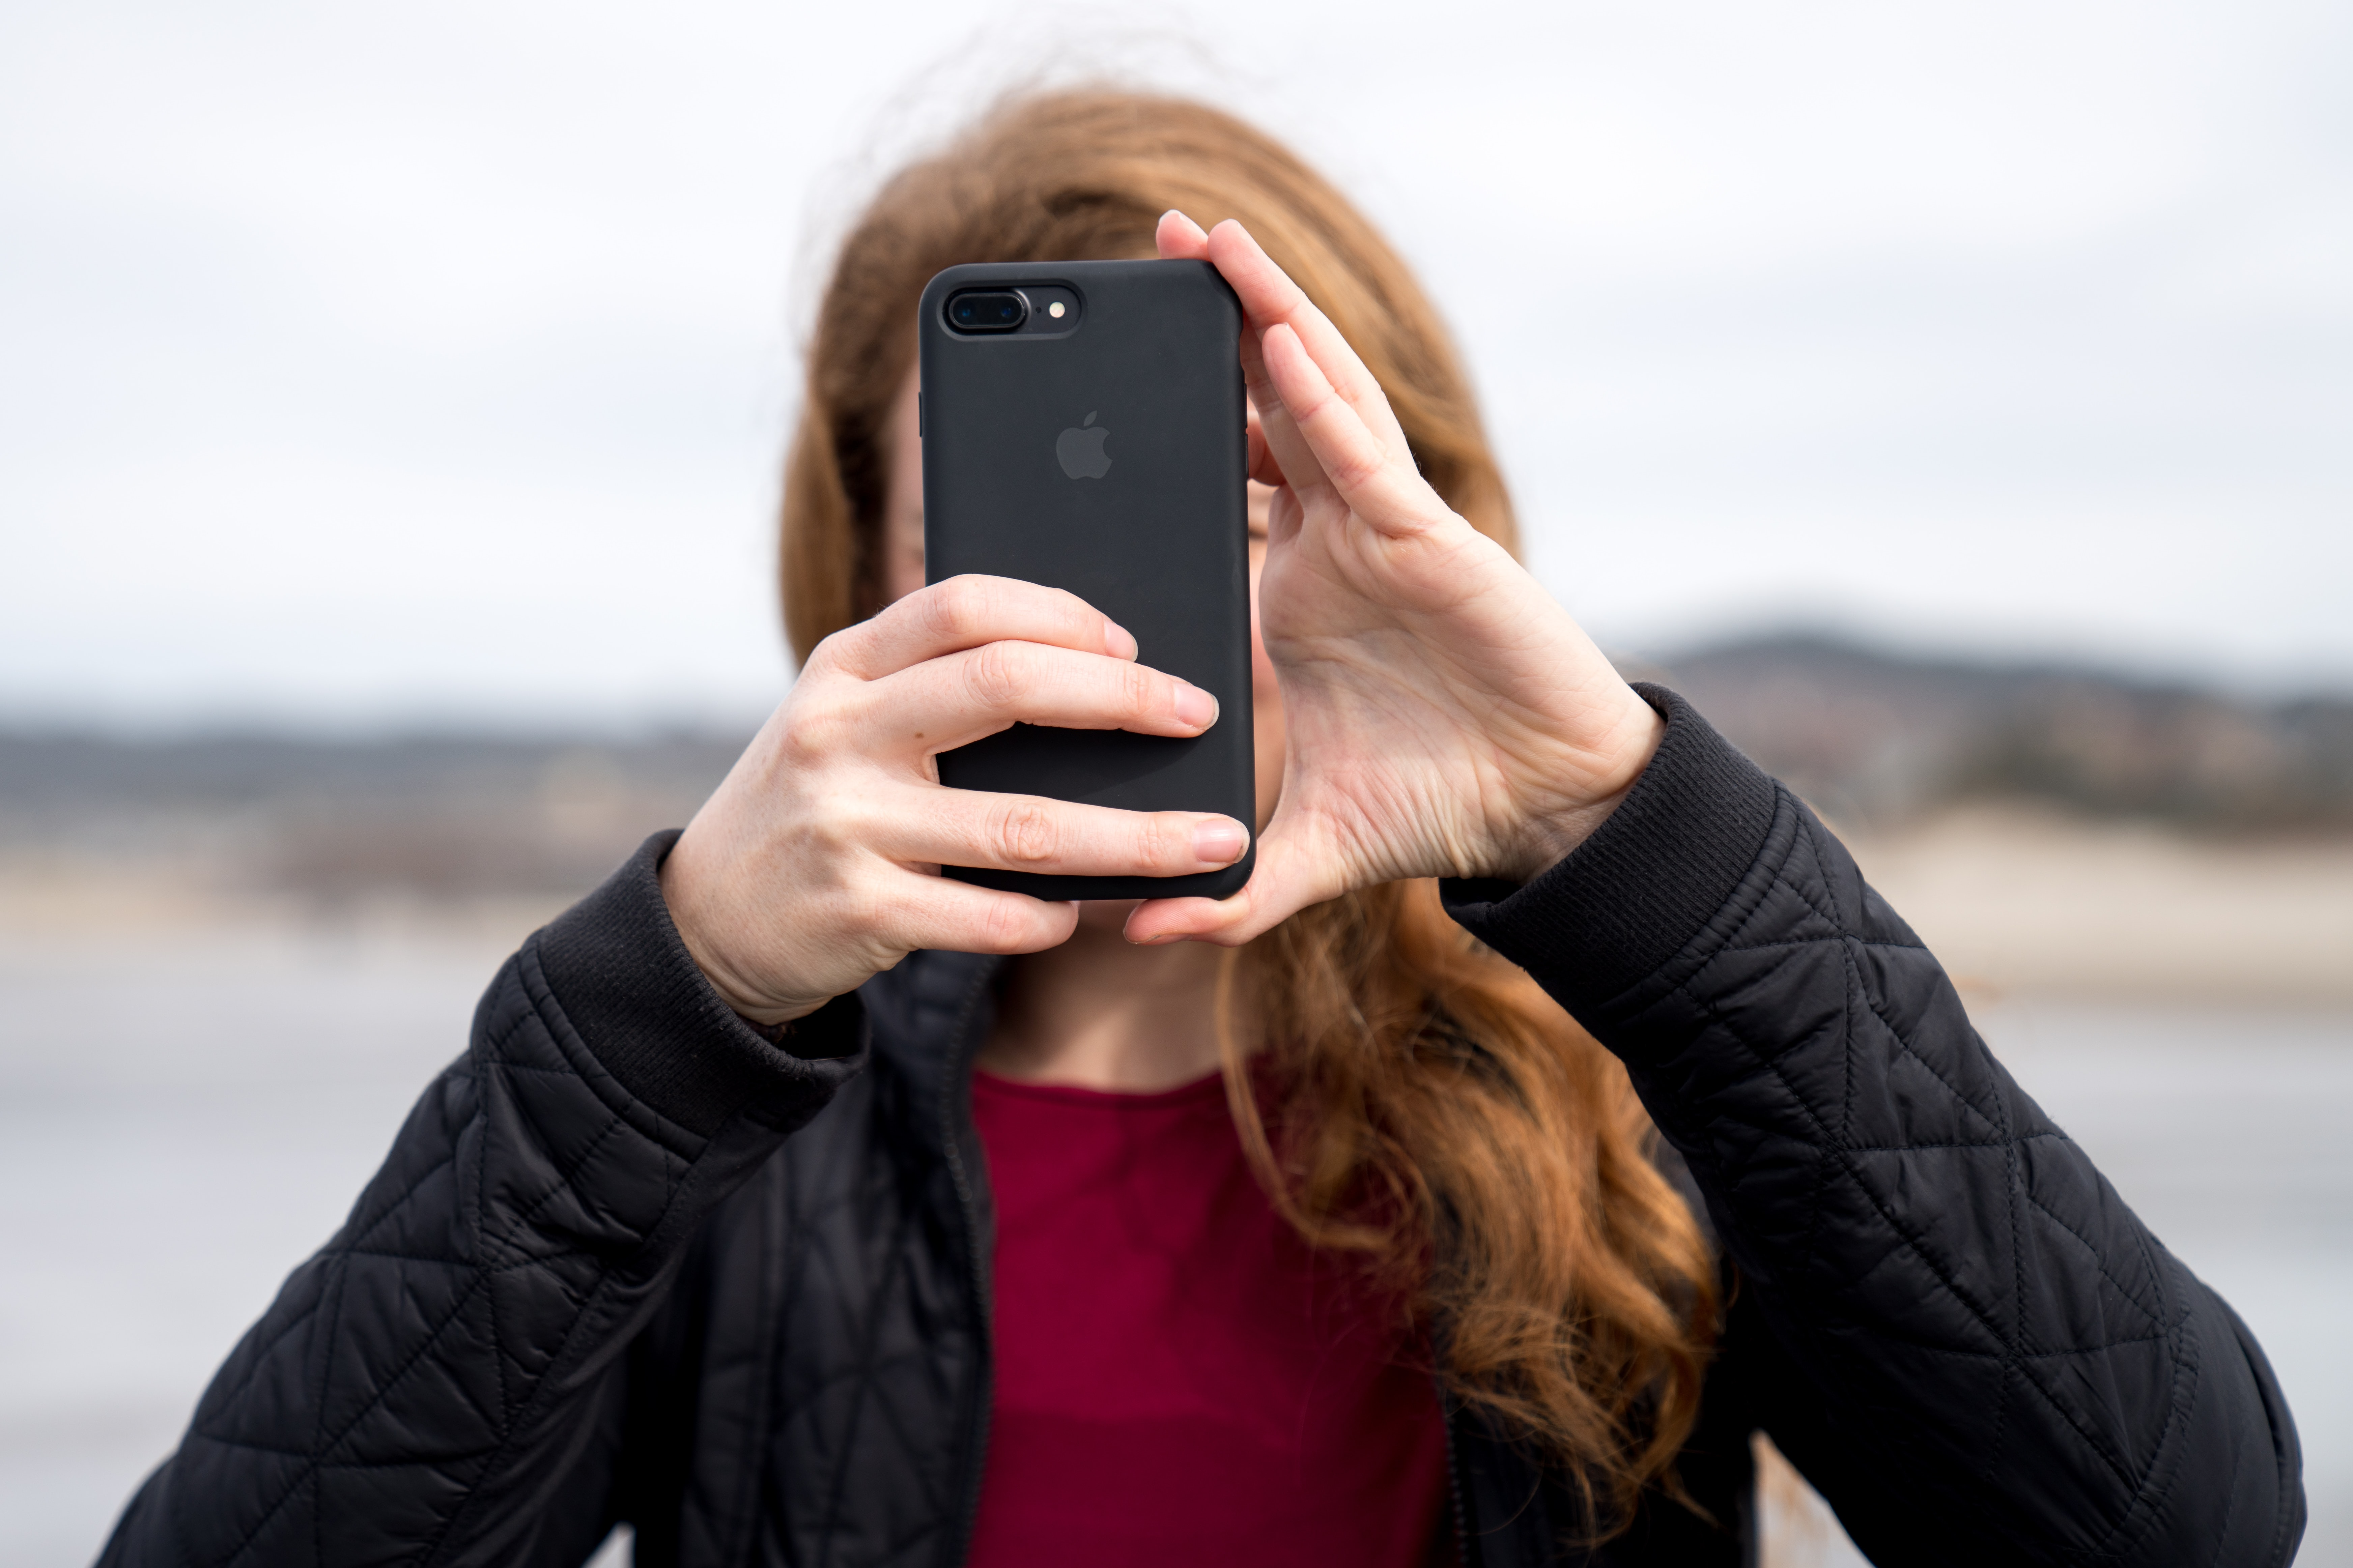 woman taking photo using black iPhone 8 Plus